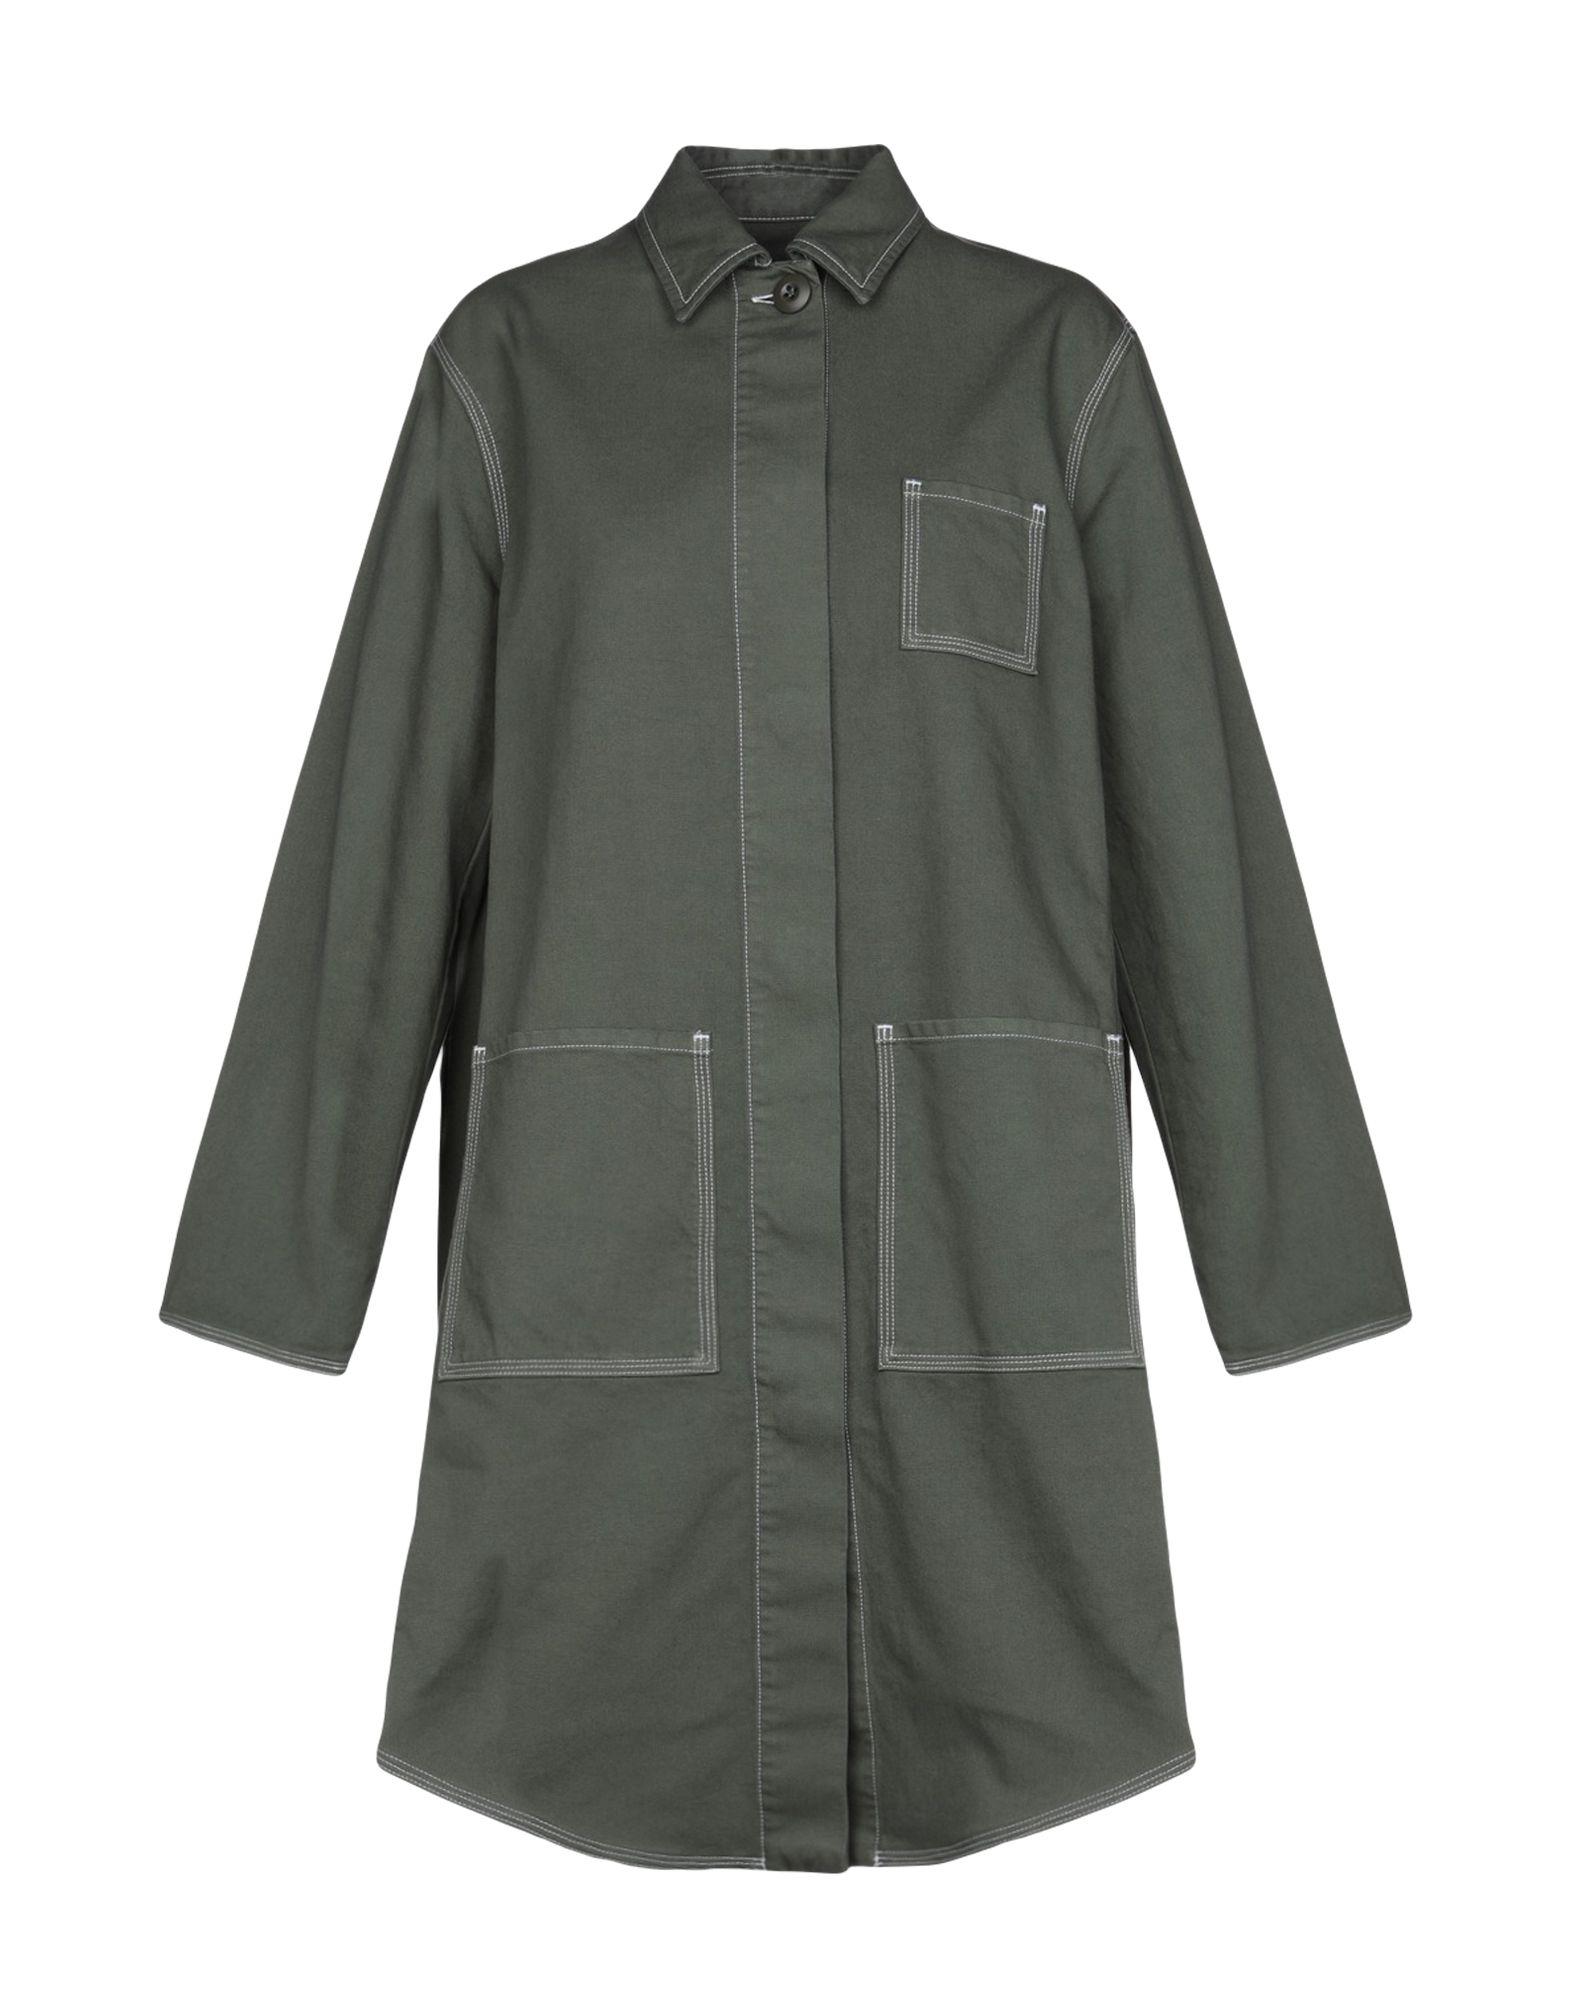 MM6 MAISON MARGIELA Легкое пальто mm6 maison margiela легкое пальто